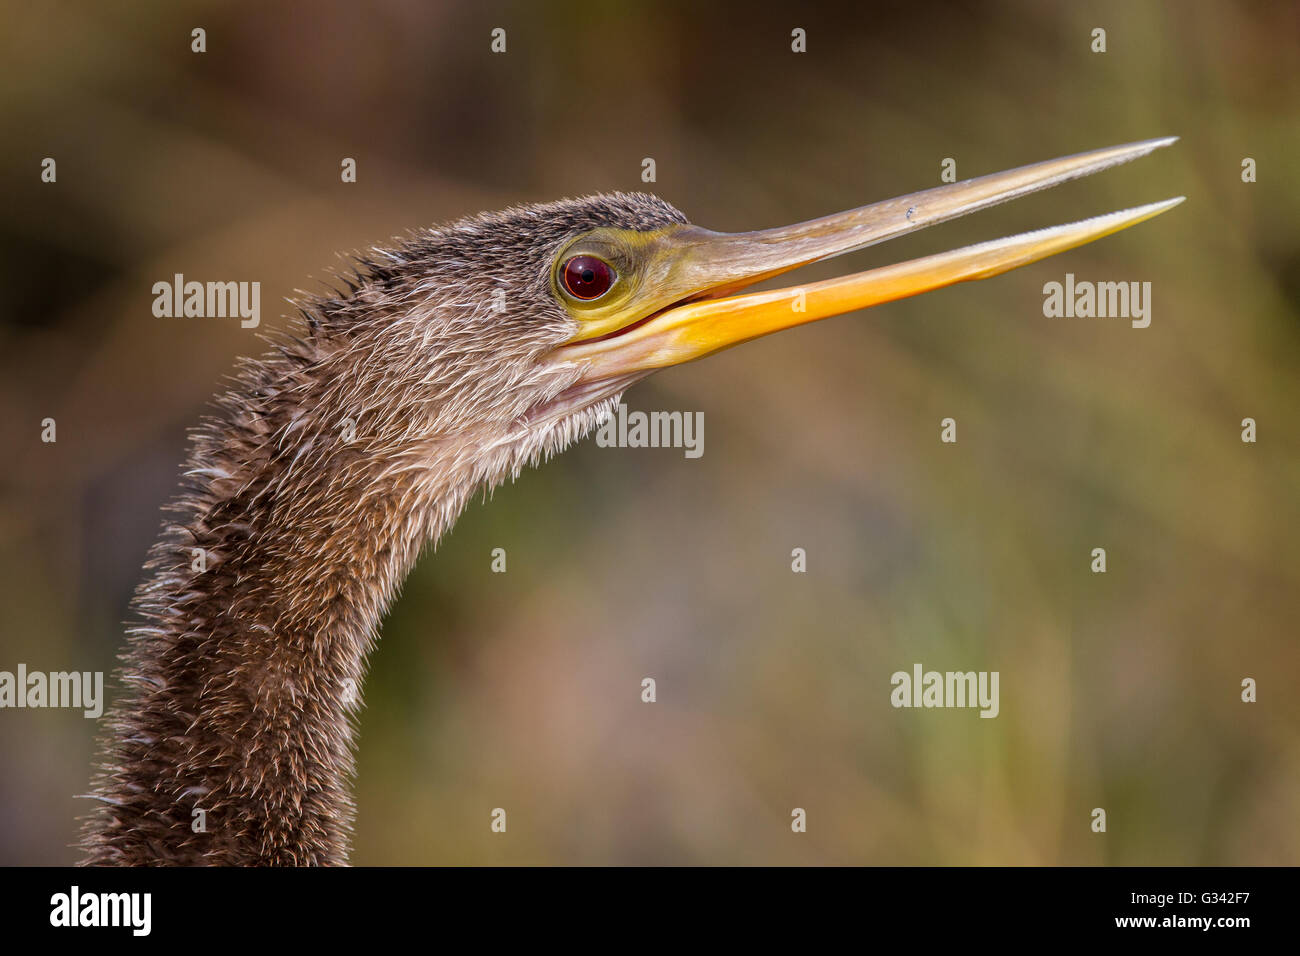 A portrait of an anhinga calling. - Stock Image